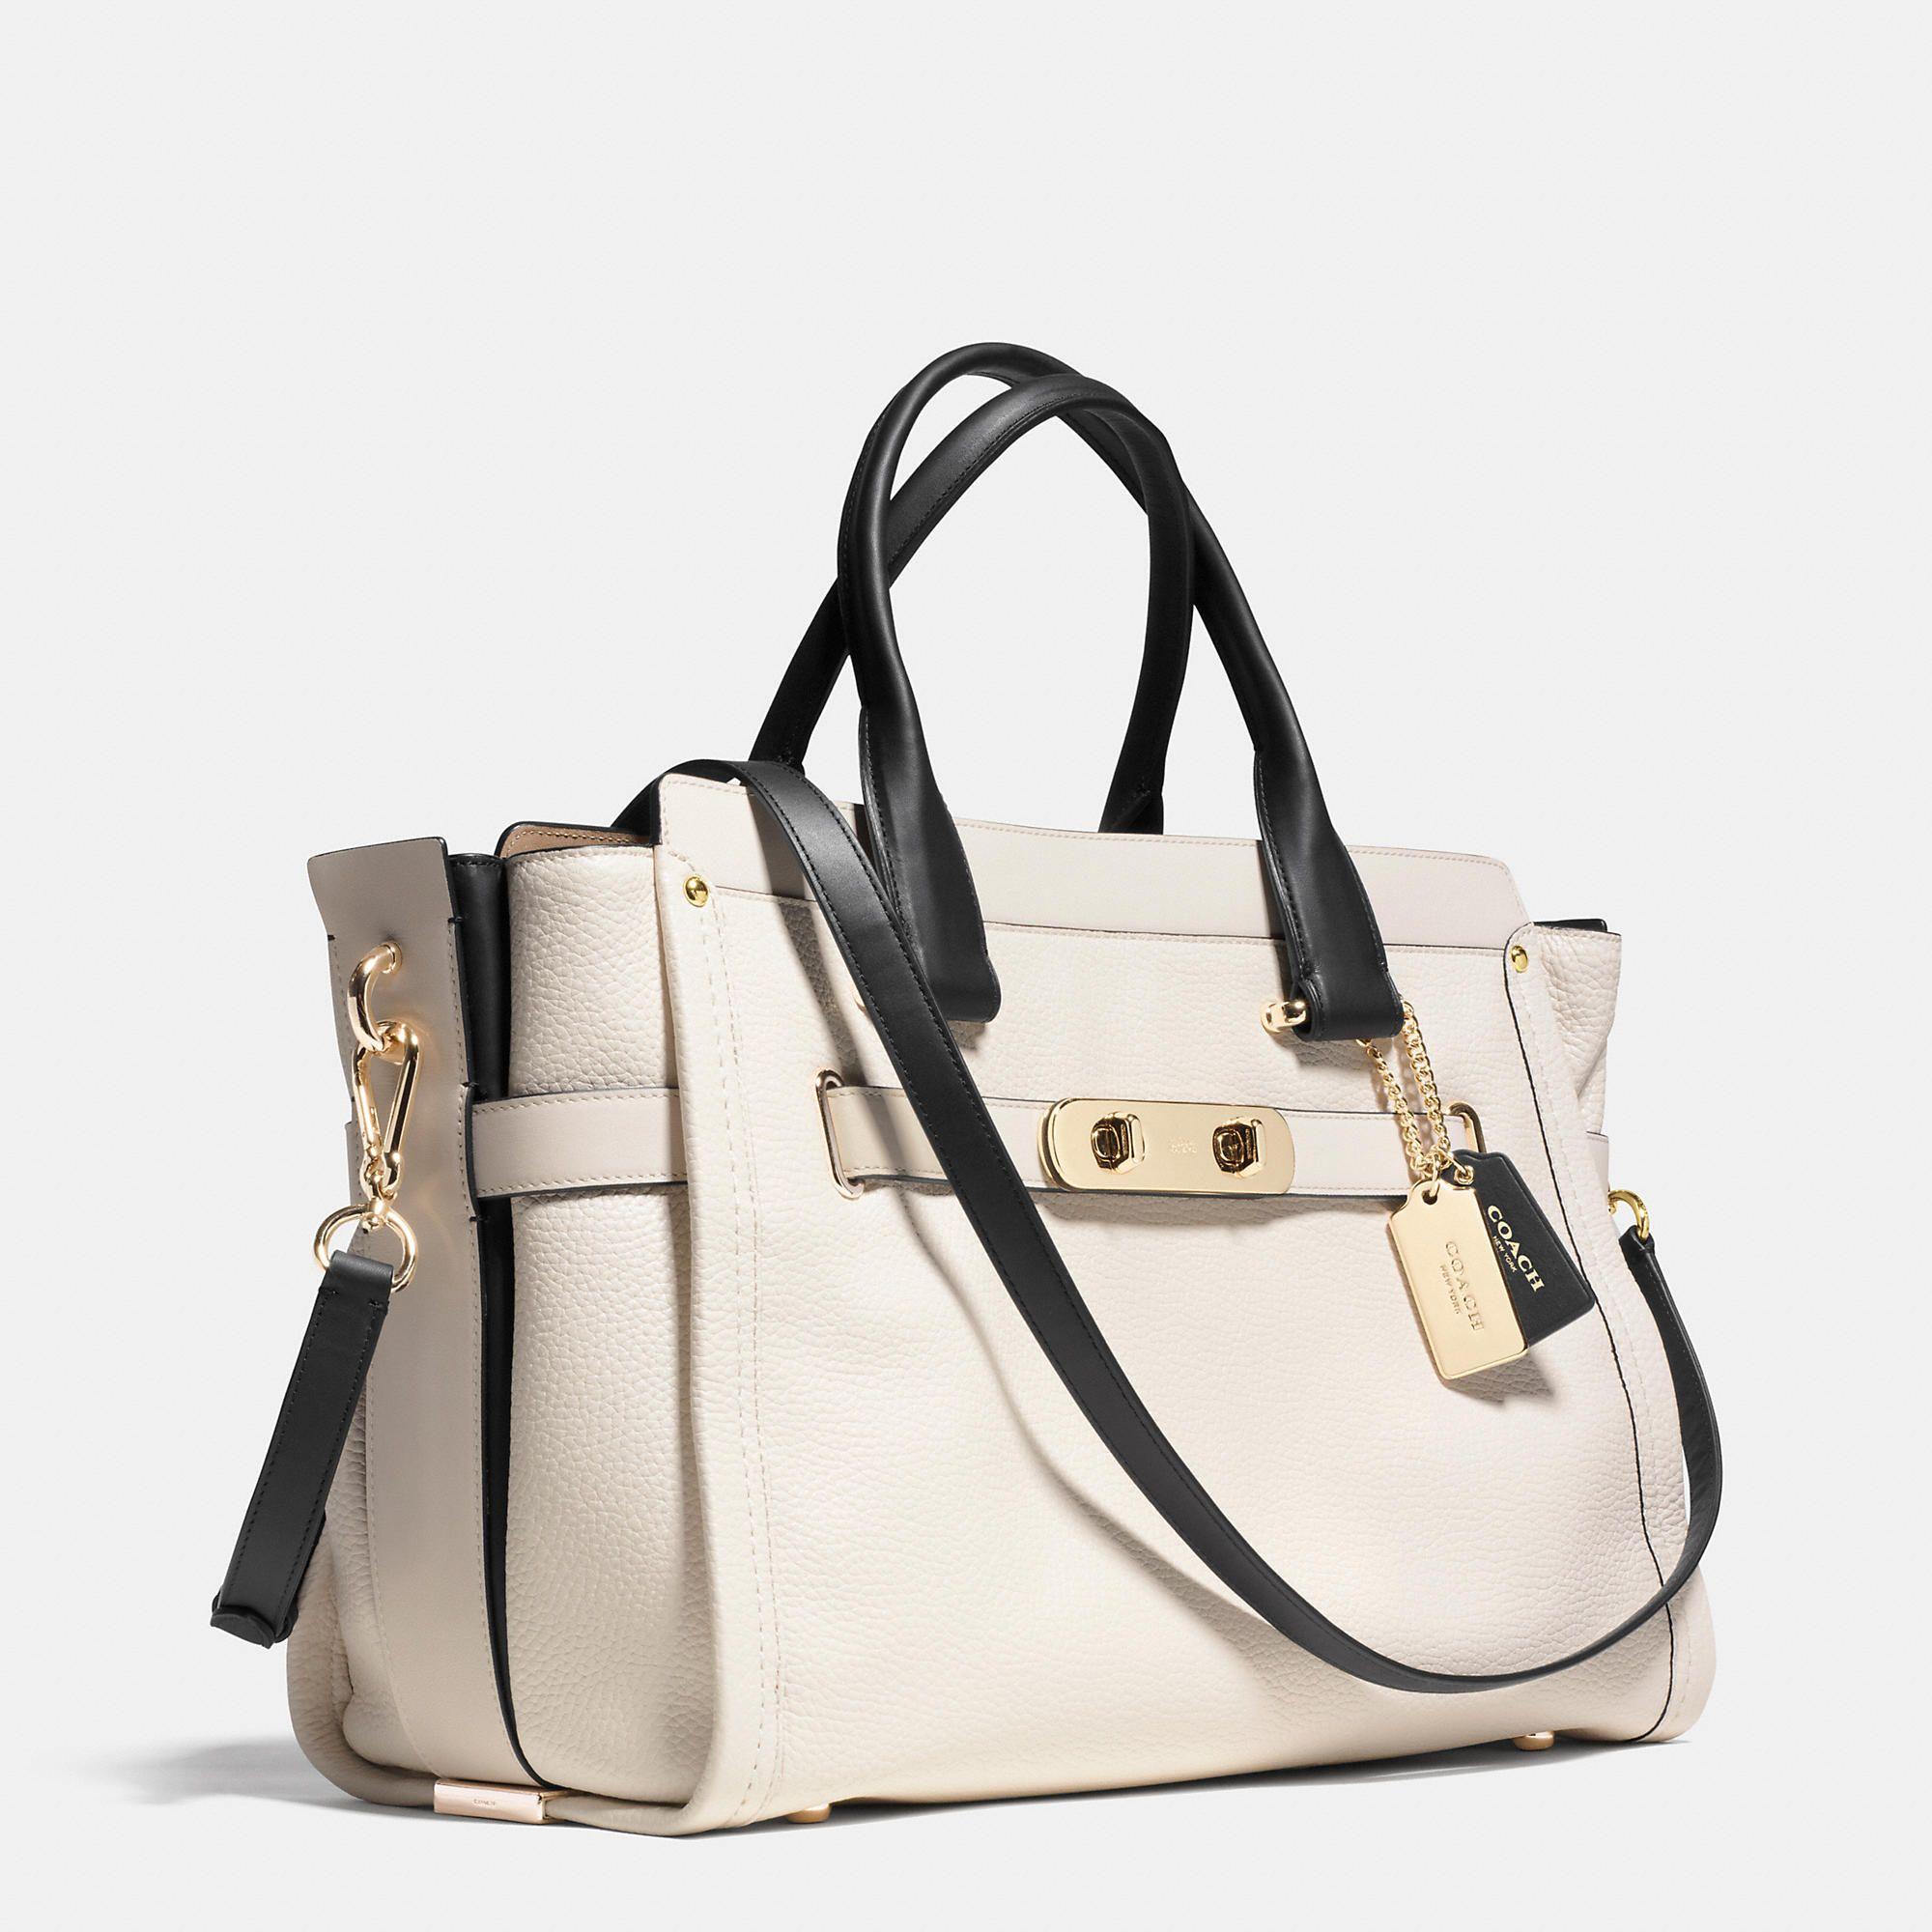 Coach outlet designer handbags handbags 2018 for Designer couch outlet